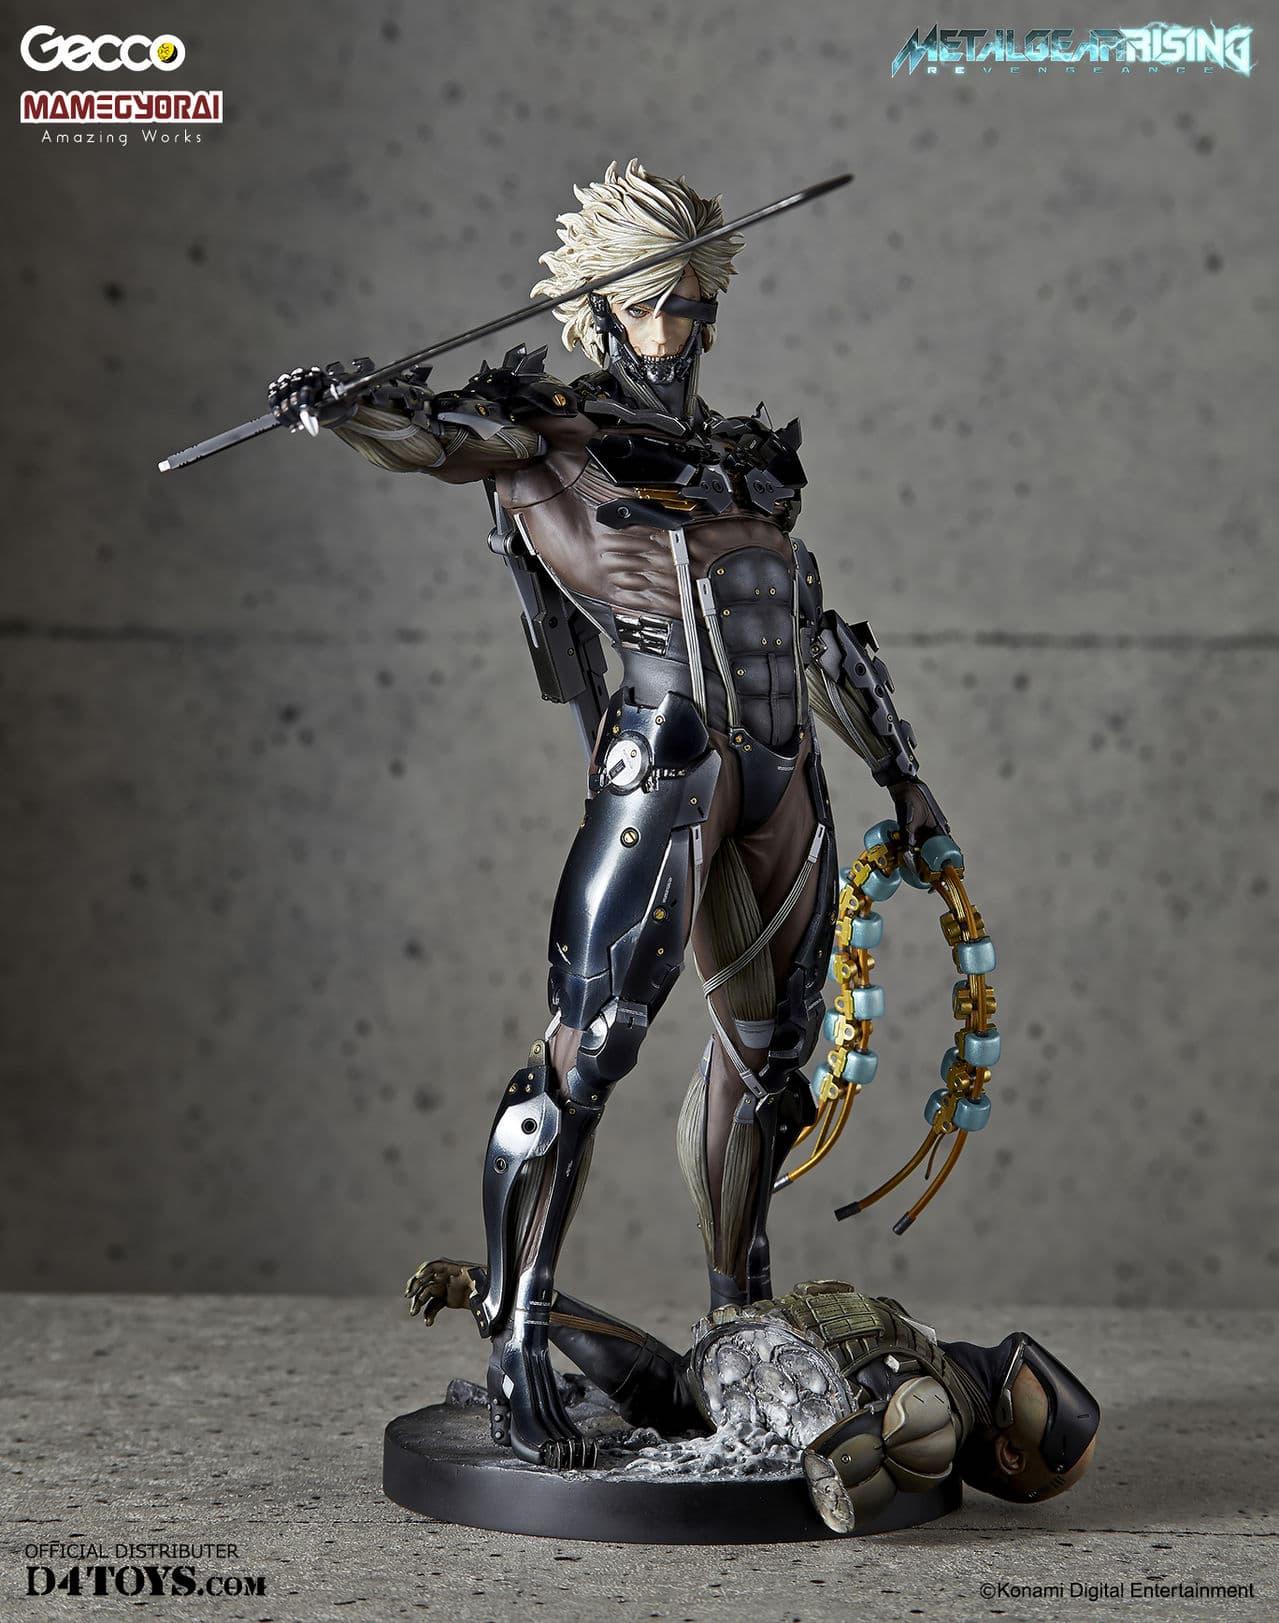 [Gecco,  Mamegyorai] Metal Gear Rising: Revengeance - RAIDEN White Armor 1/6 - SDCC2015 Exclusive - Página 2 D4_005